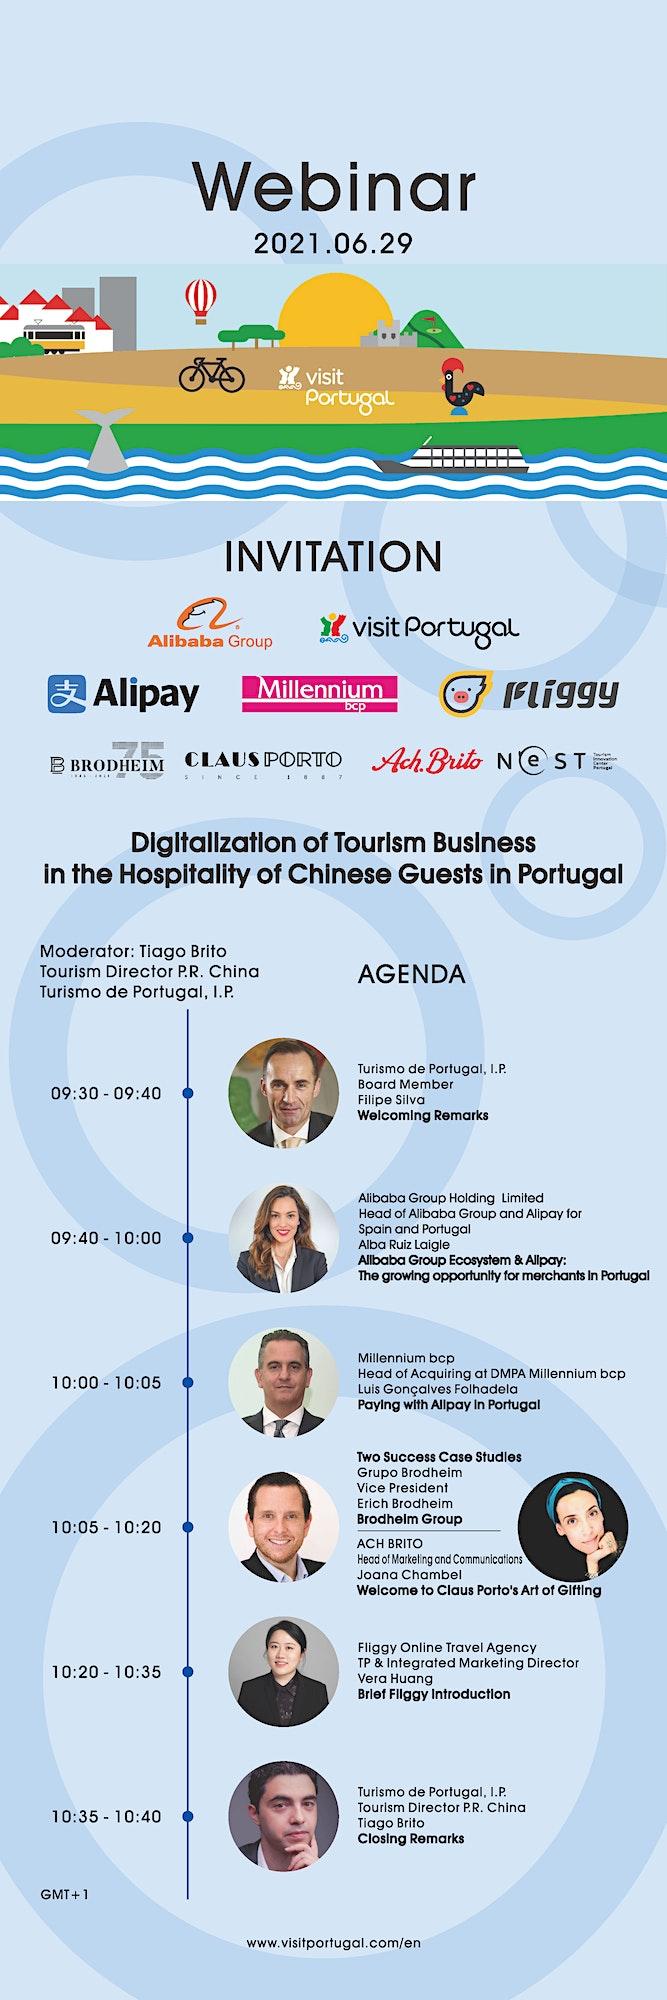 Visit Portugal & Alibaba Group - Digitalization of Tourism Business image